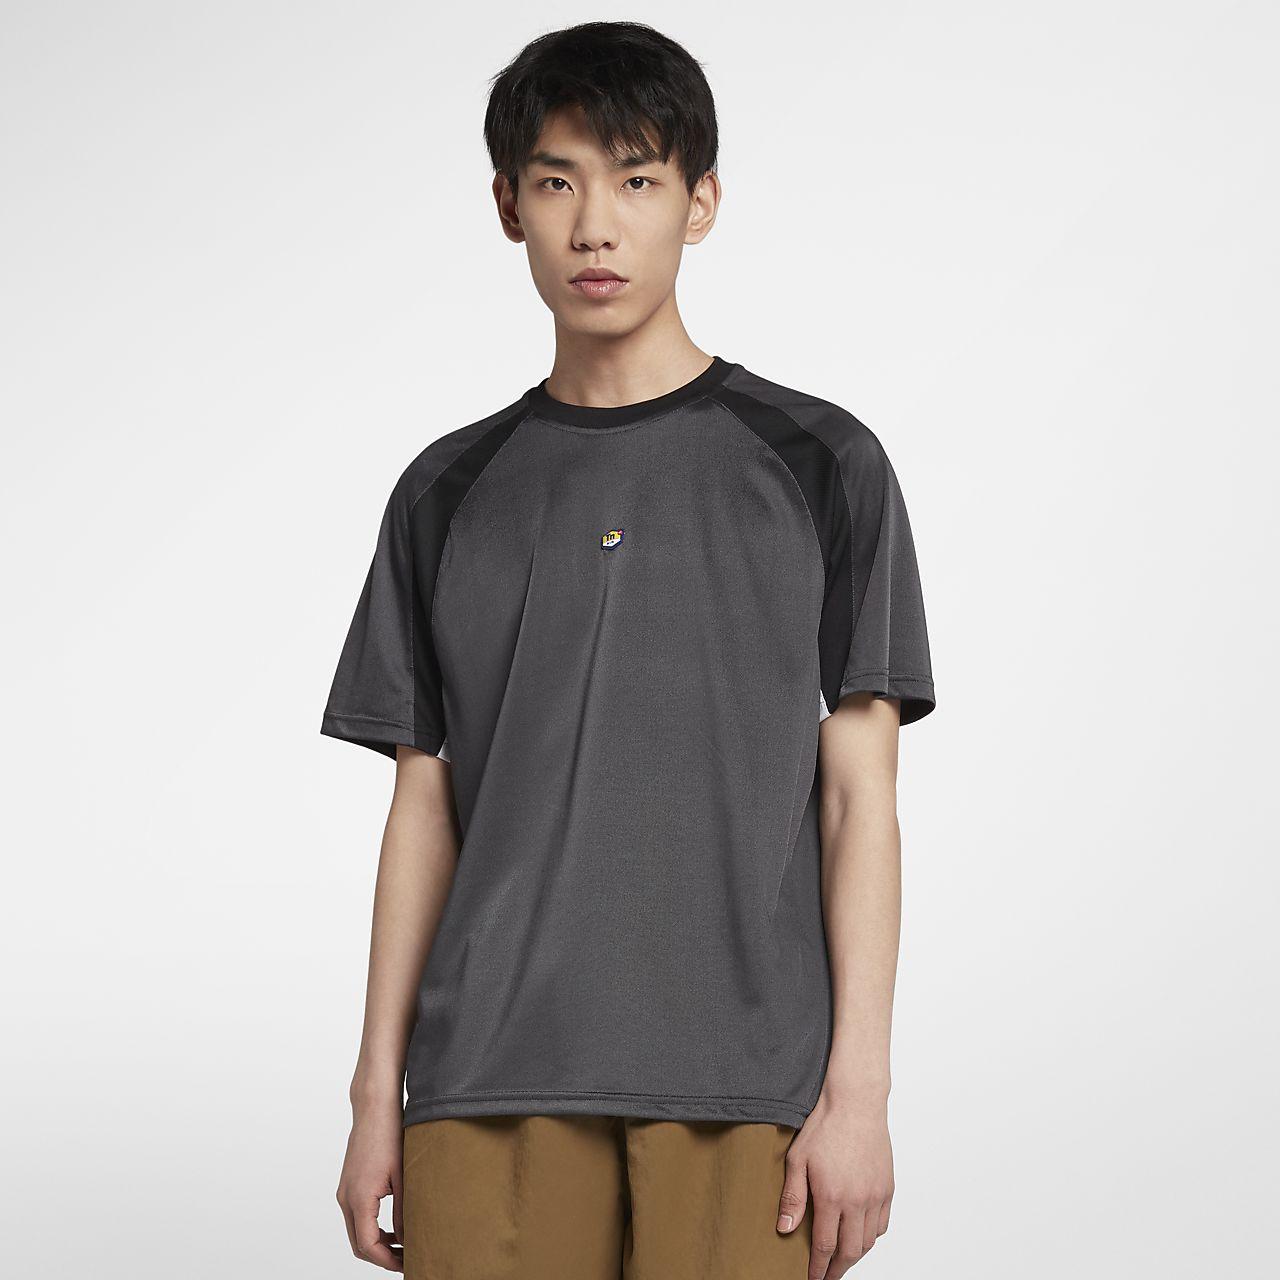 Kortärmad tröja NikeLab Collection Tri för män